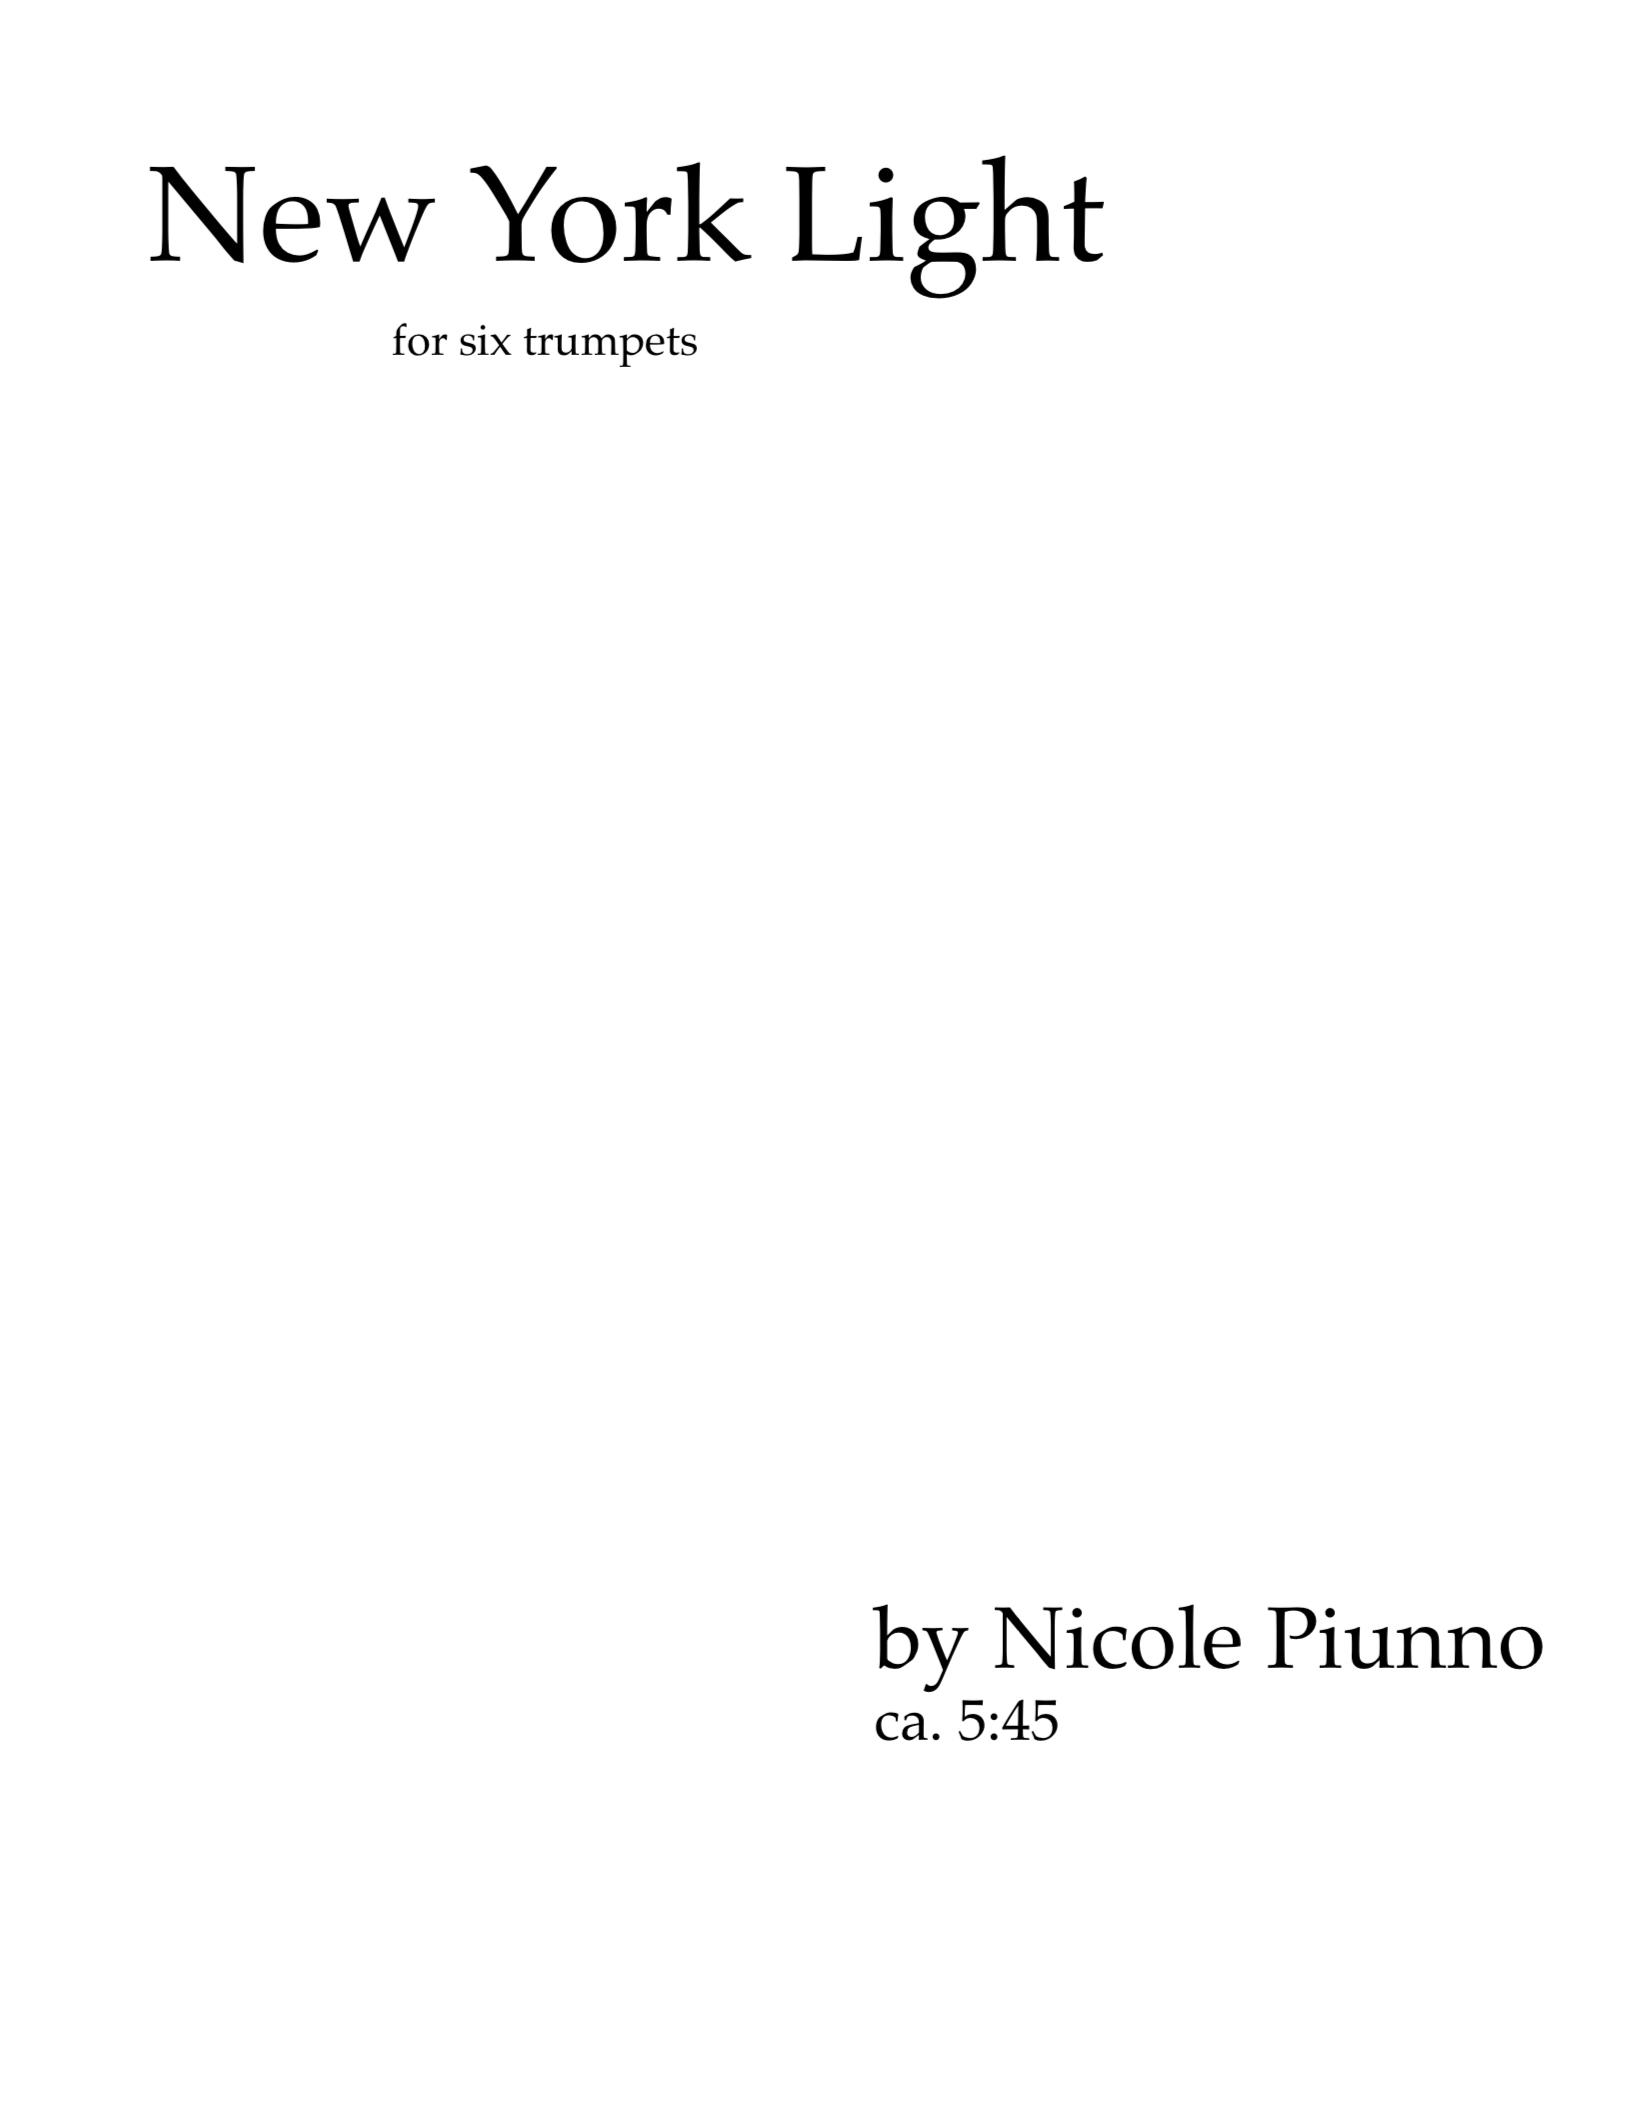 New York Light by Nicole Piunno